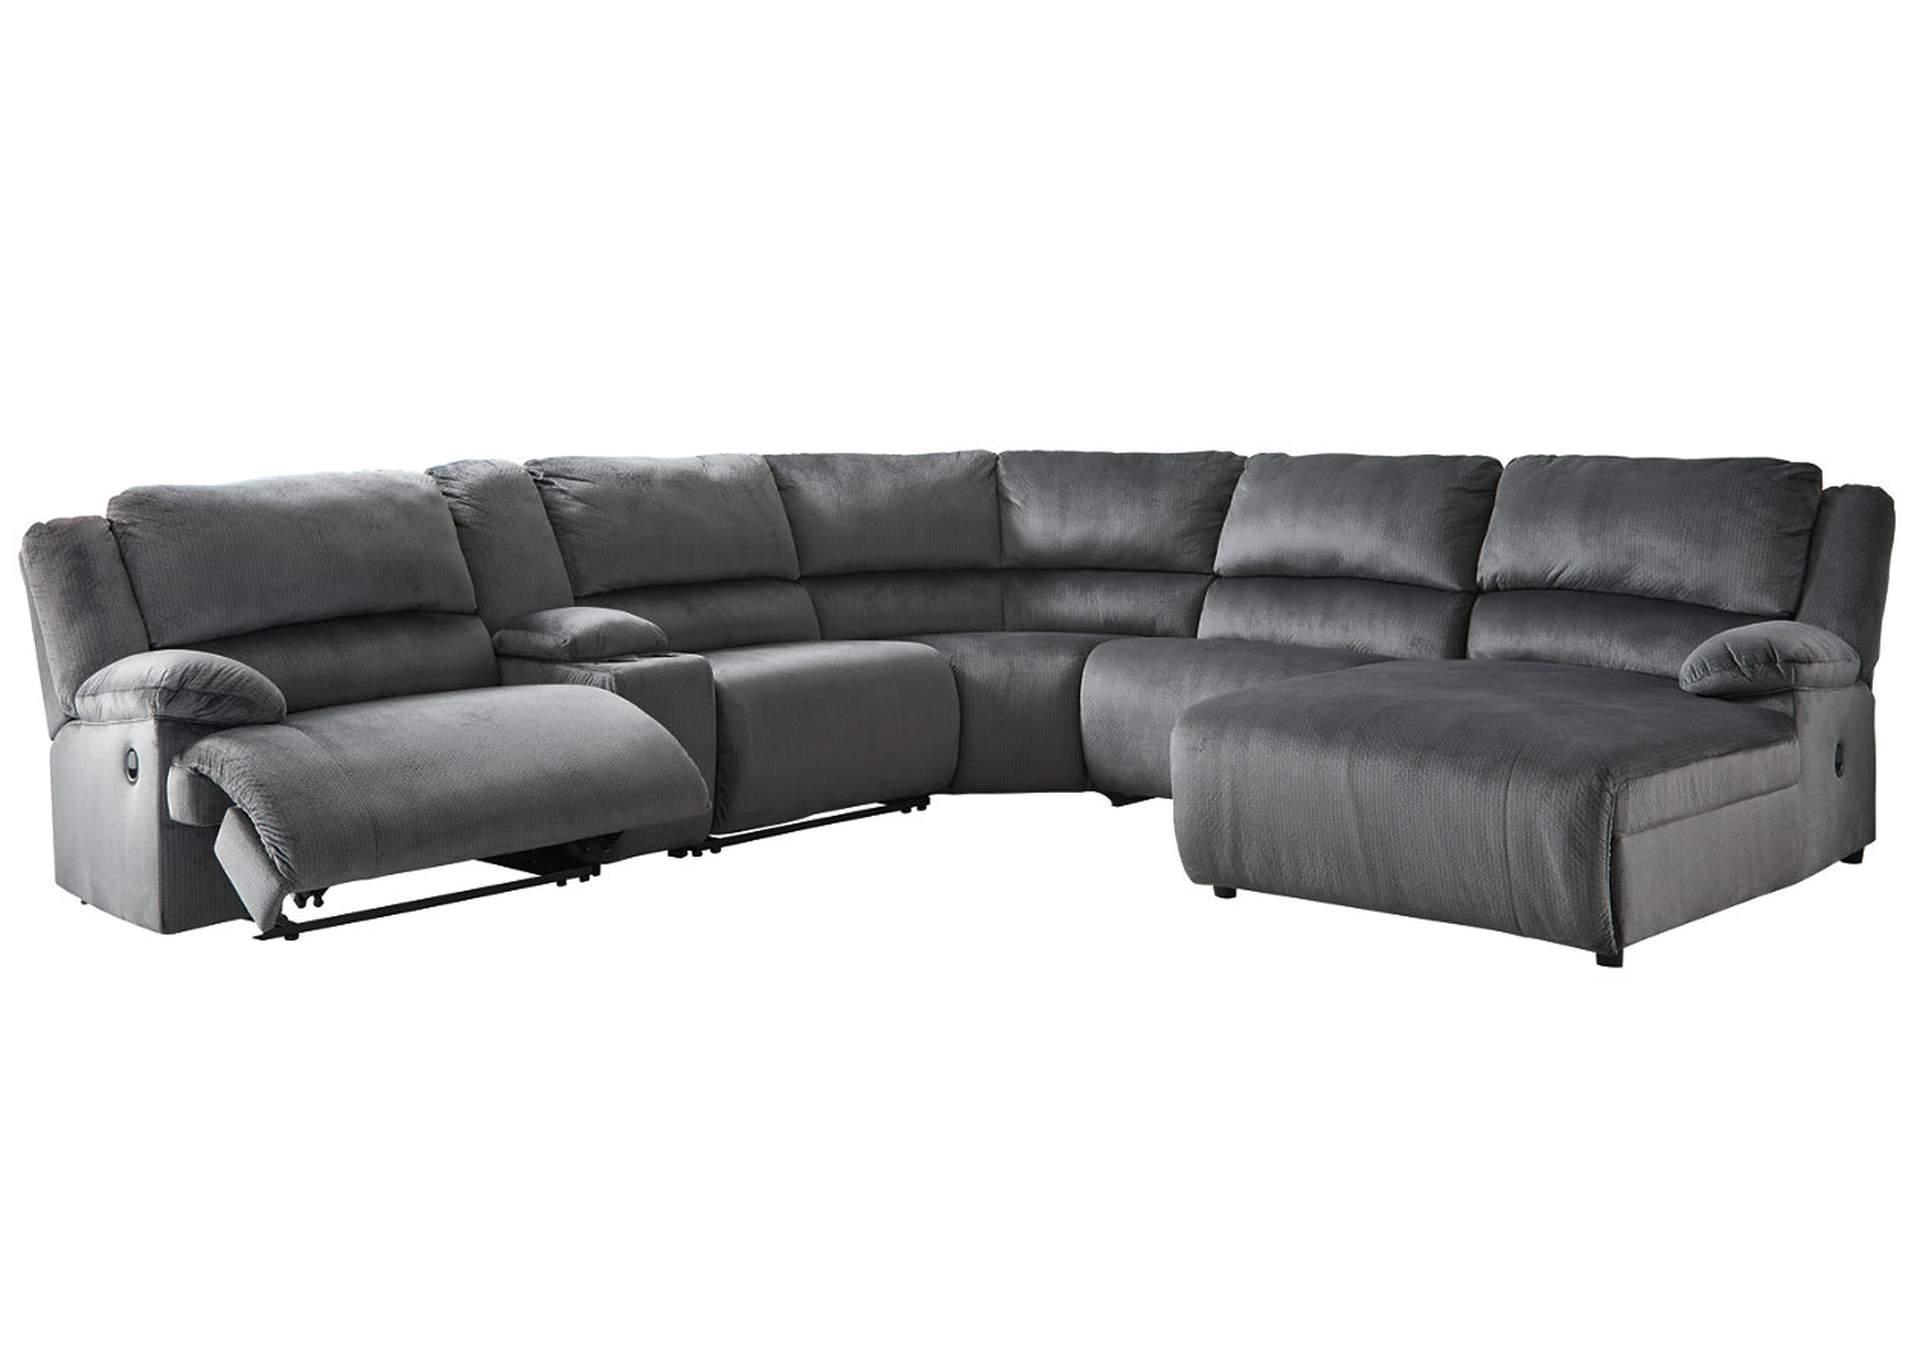 Remarkable Furniture American Furniture Of Slidell Clonmel Charcoal Inzonedesignstudio Interior Chair Design Inzonedesignstudiocom